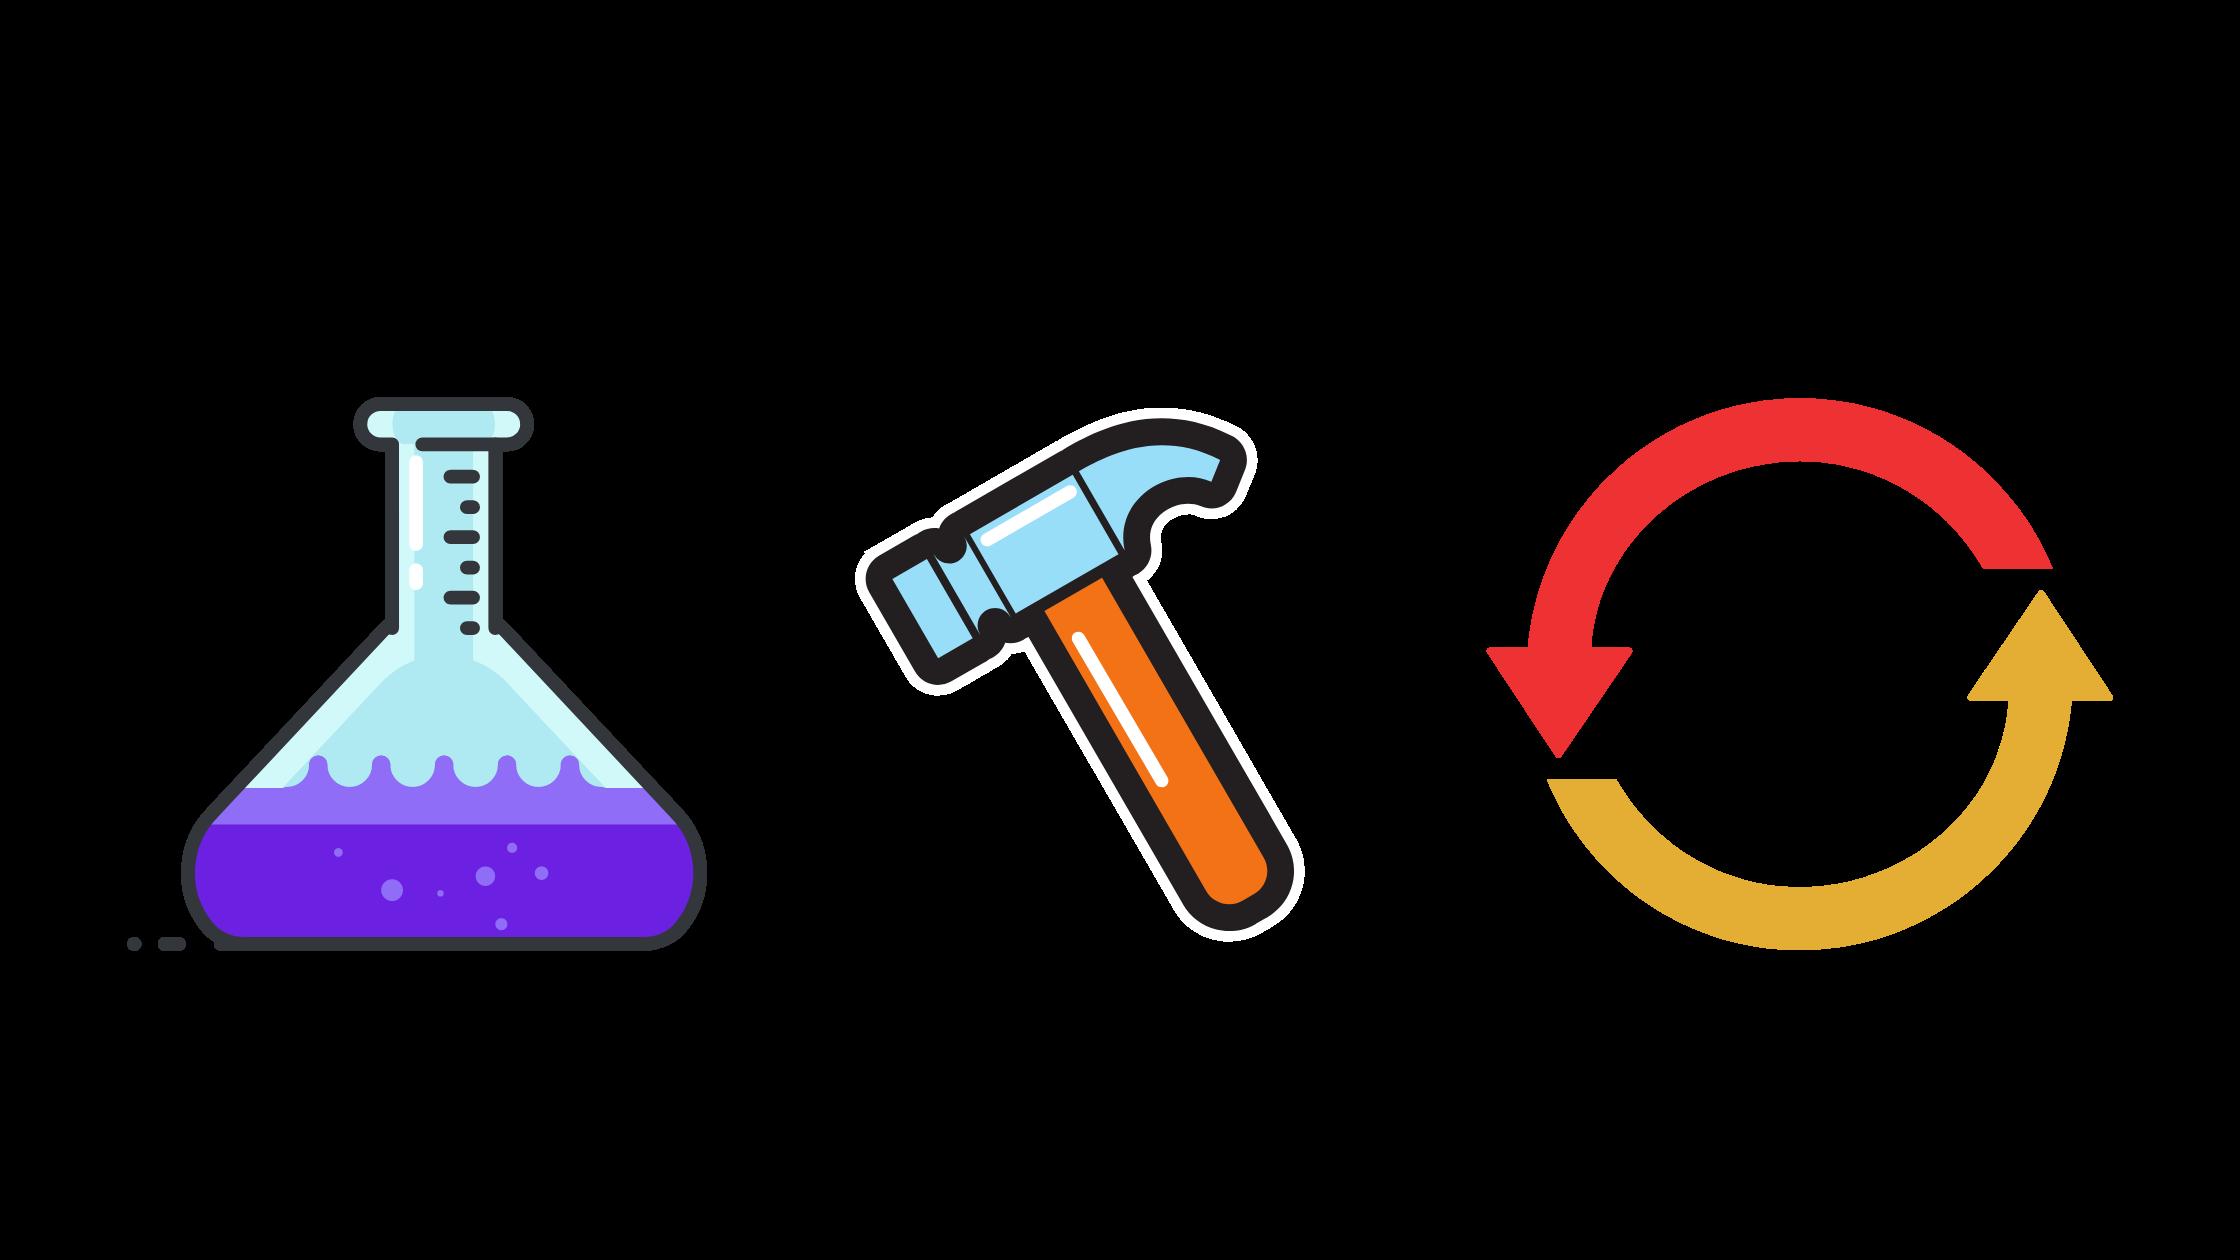 Test, tweak, repeat illustrations